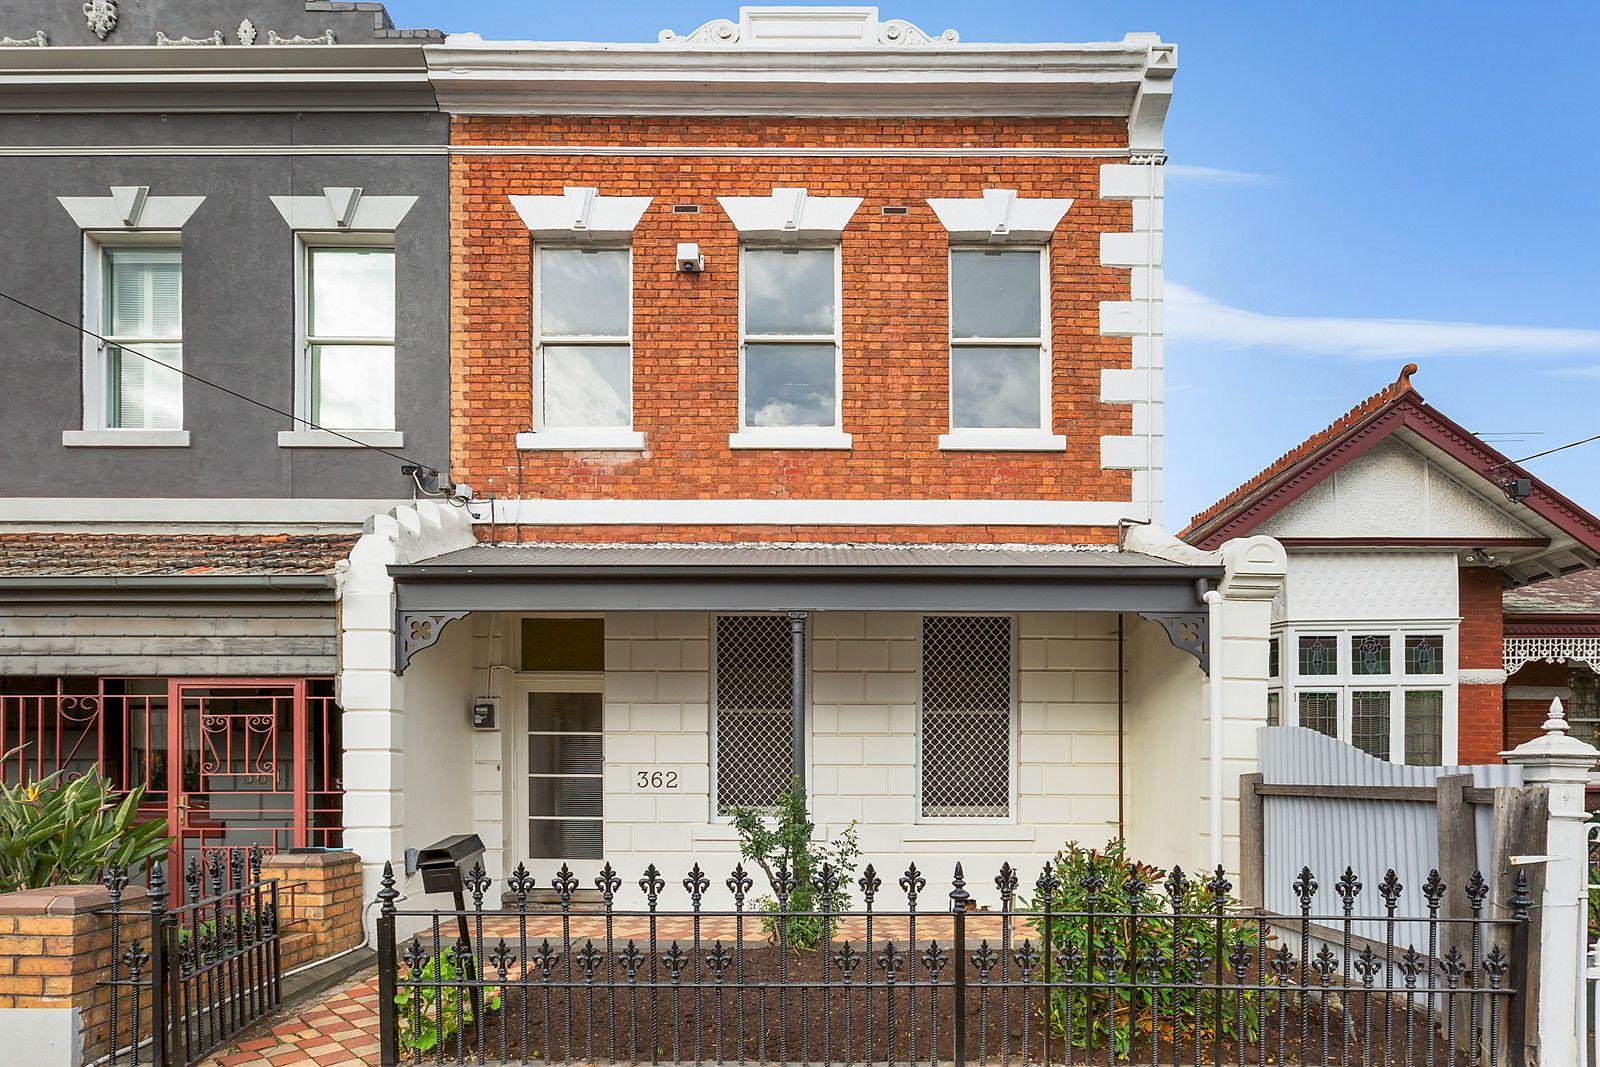 362 Nicholson Street, Fitzroy VIC 3065, Image 0